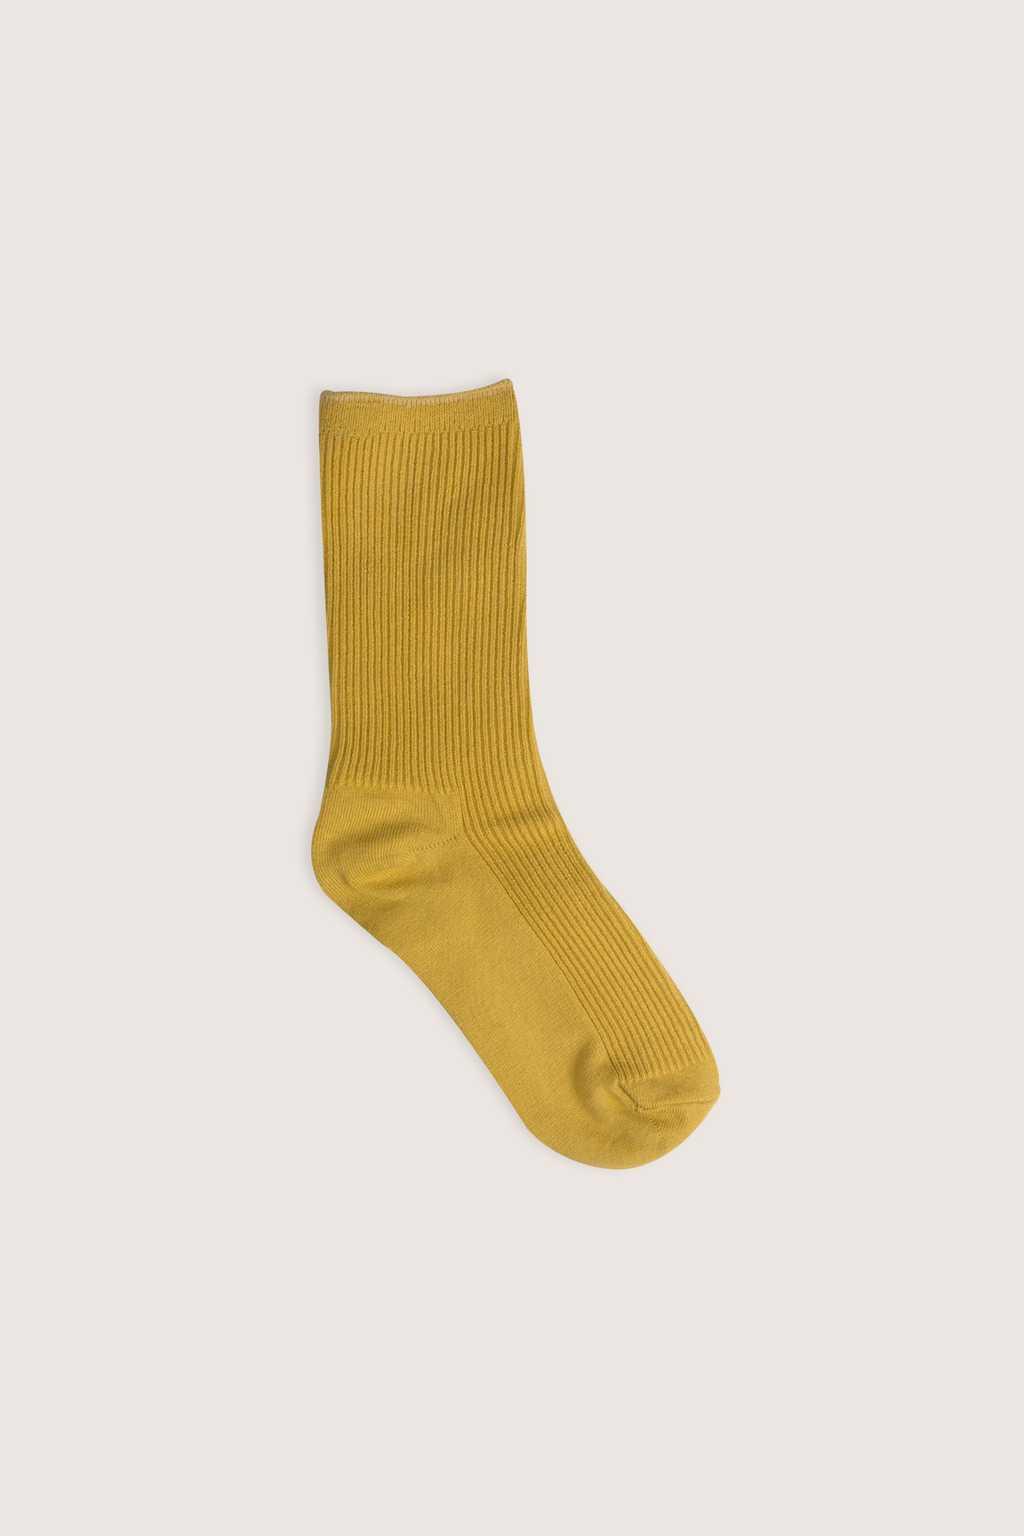 Sock H030 Yellow 4